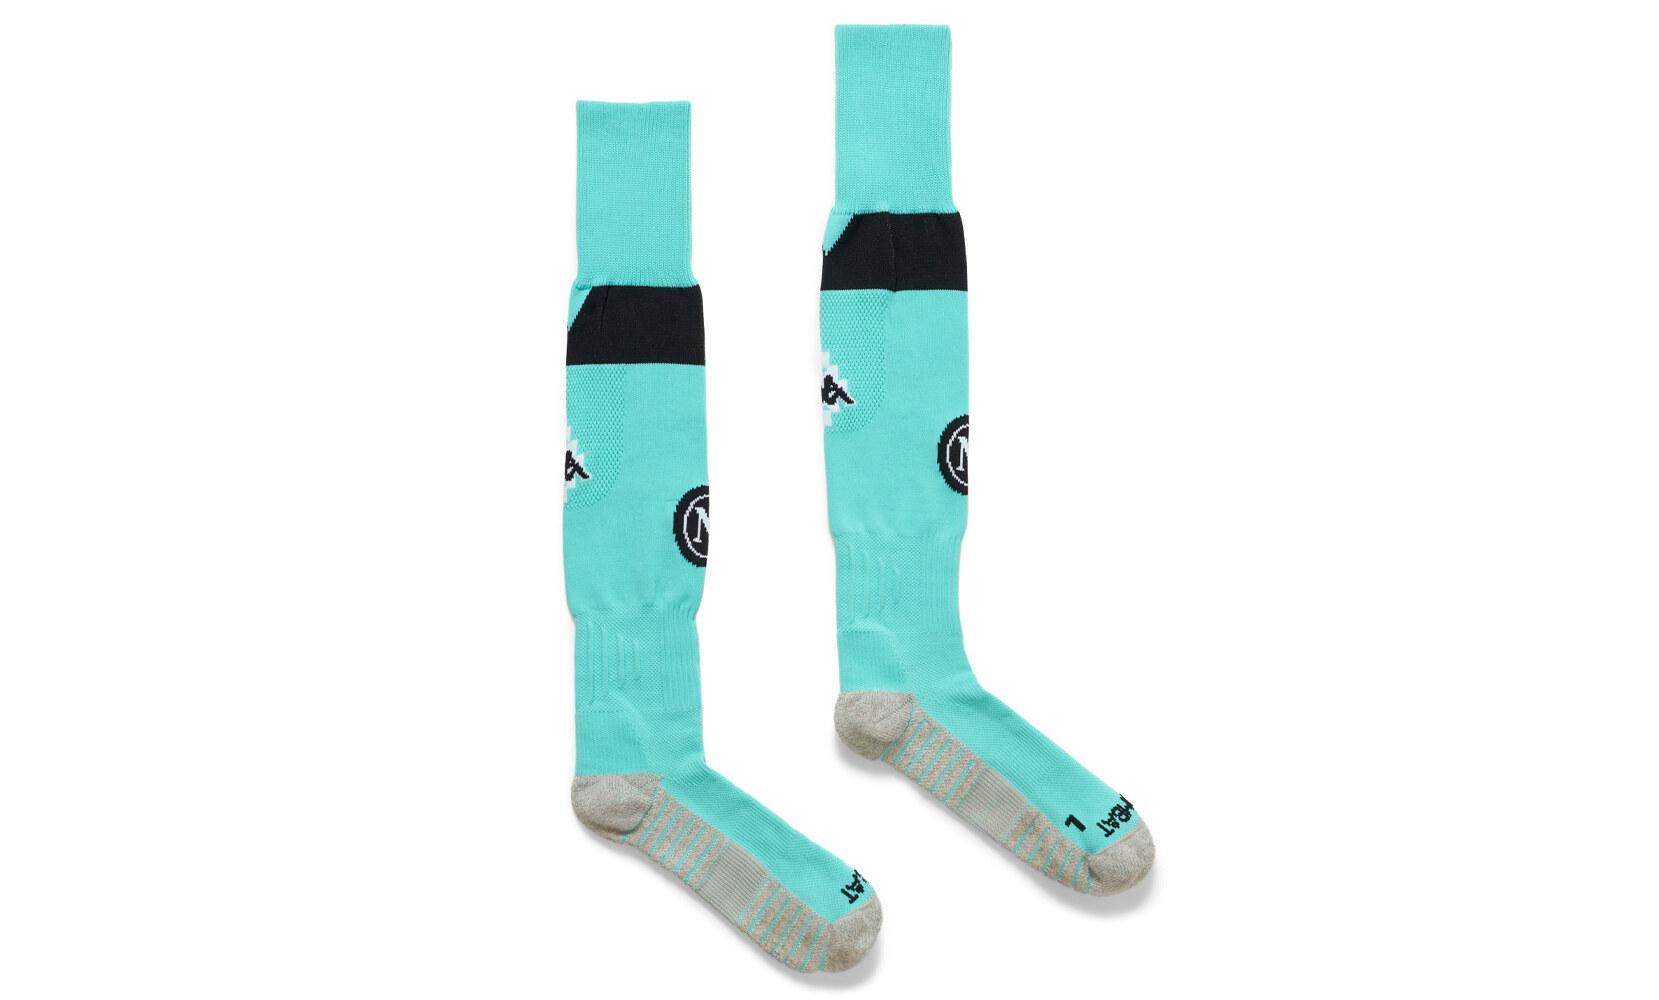 Marcelo Burlon Kappa x SSC Napoli Socks